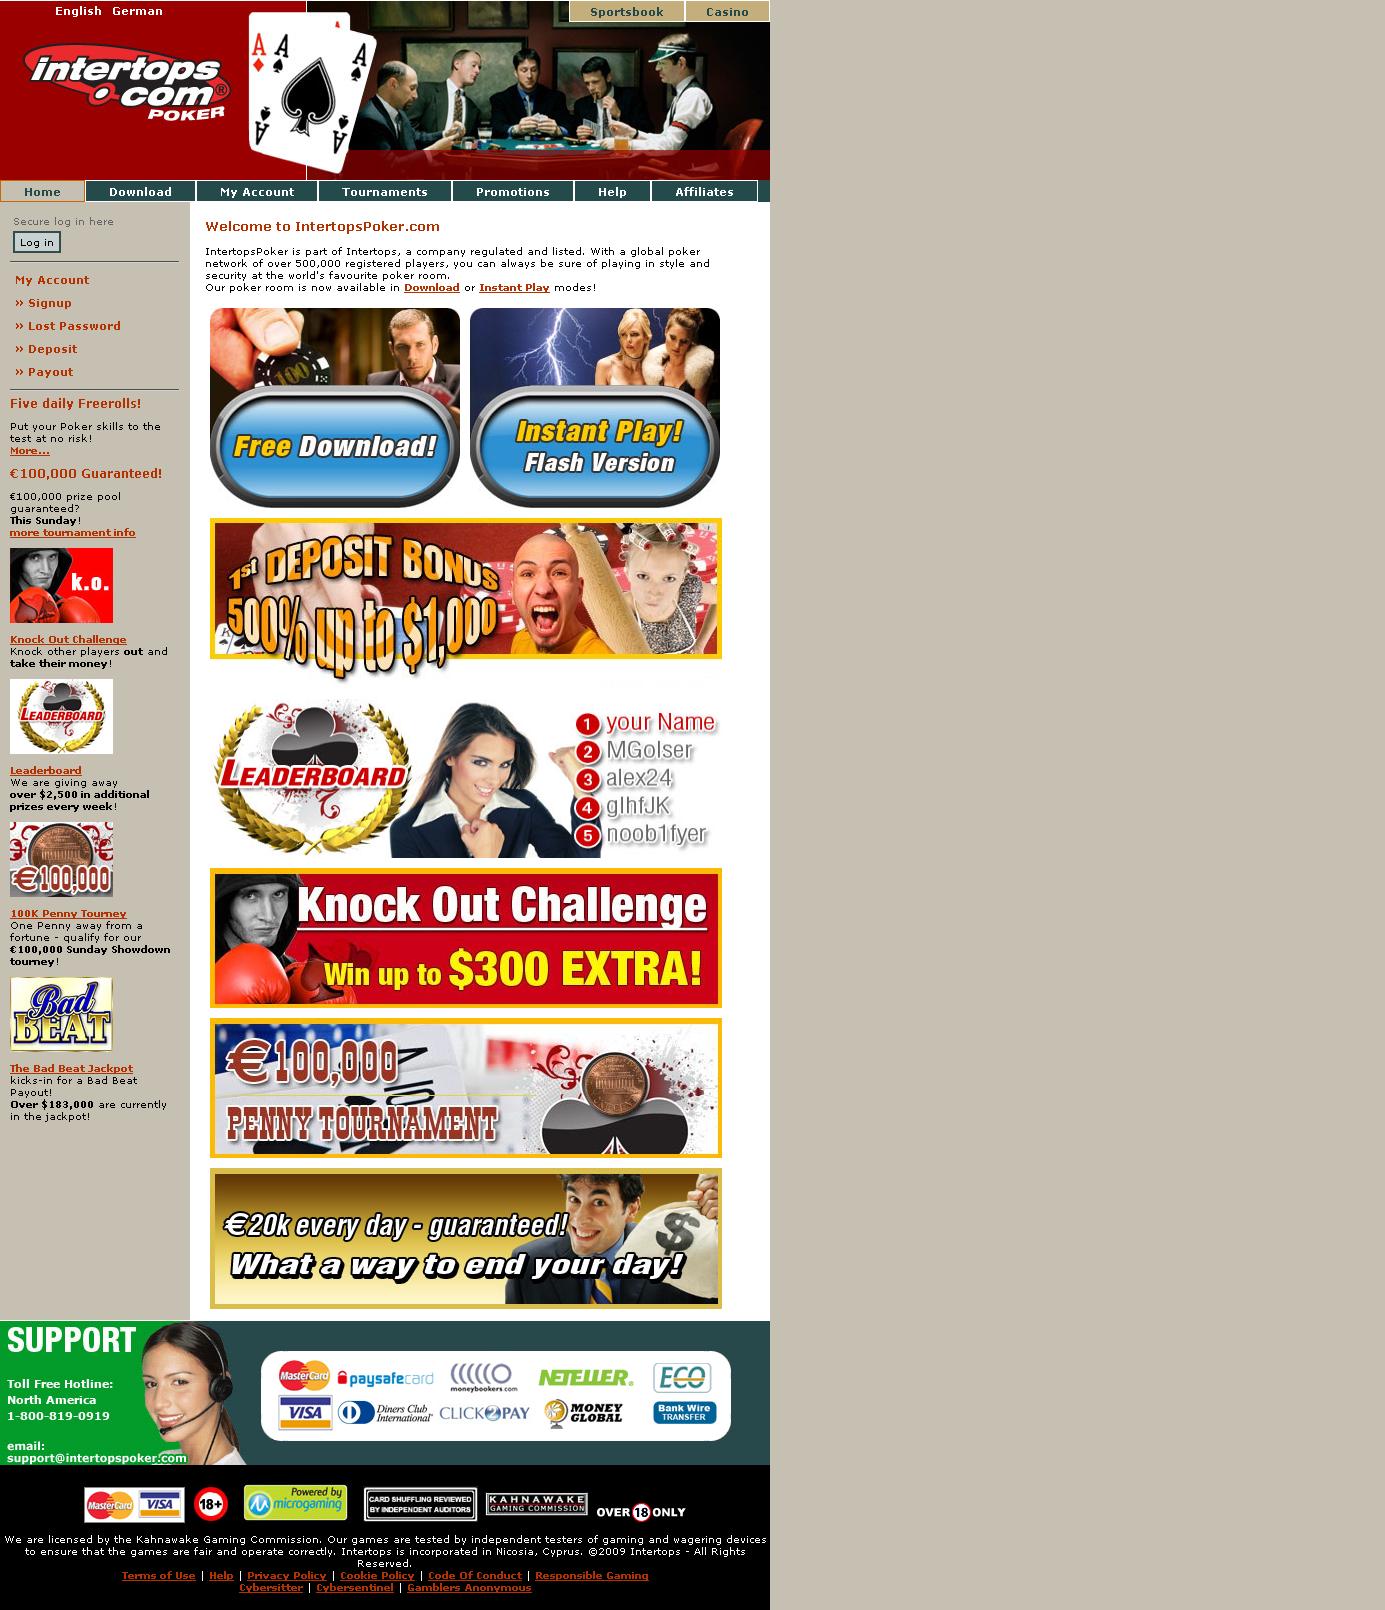 Nuevas salas de poker online OpenBet-894618